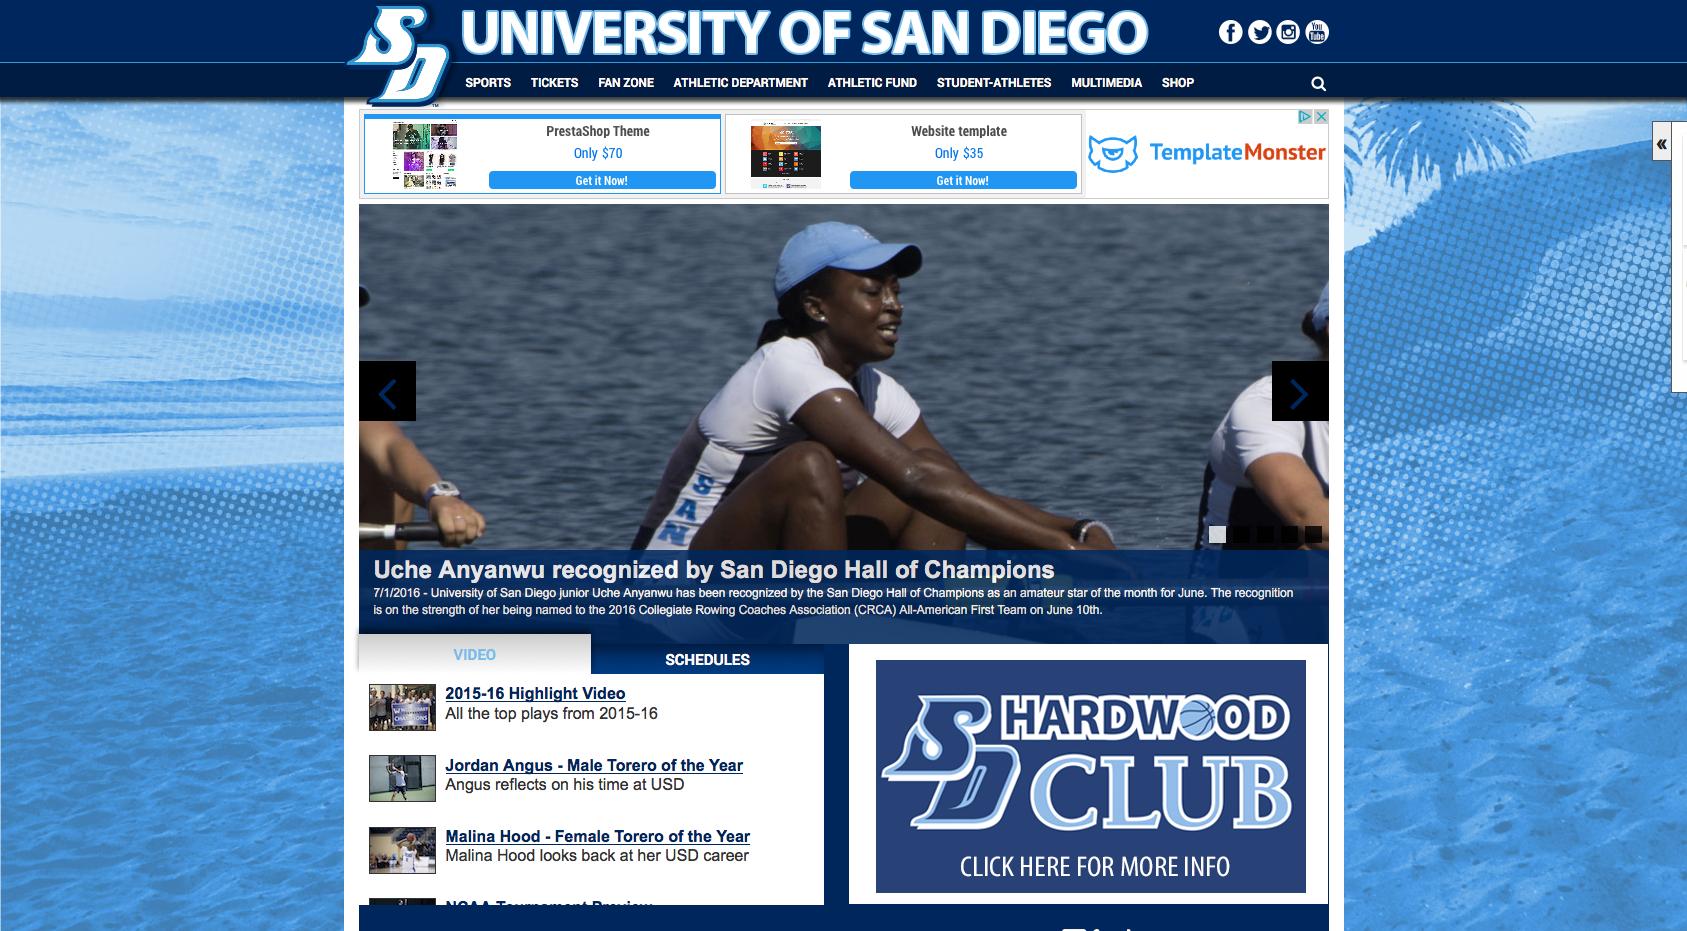 usdtoreros.com_-_University_of_San_Diego_Official_Athletic_Site_-_2016-07-05_15.26.09.png